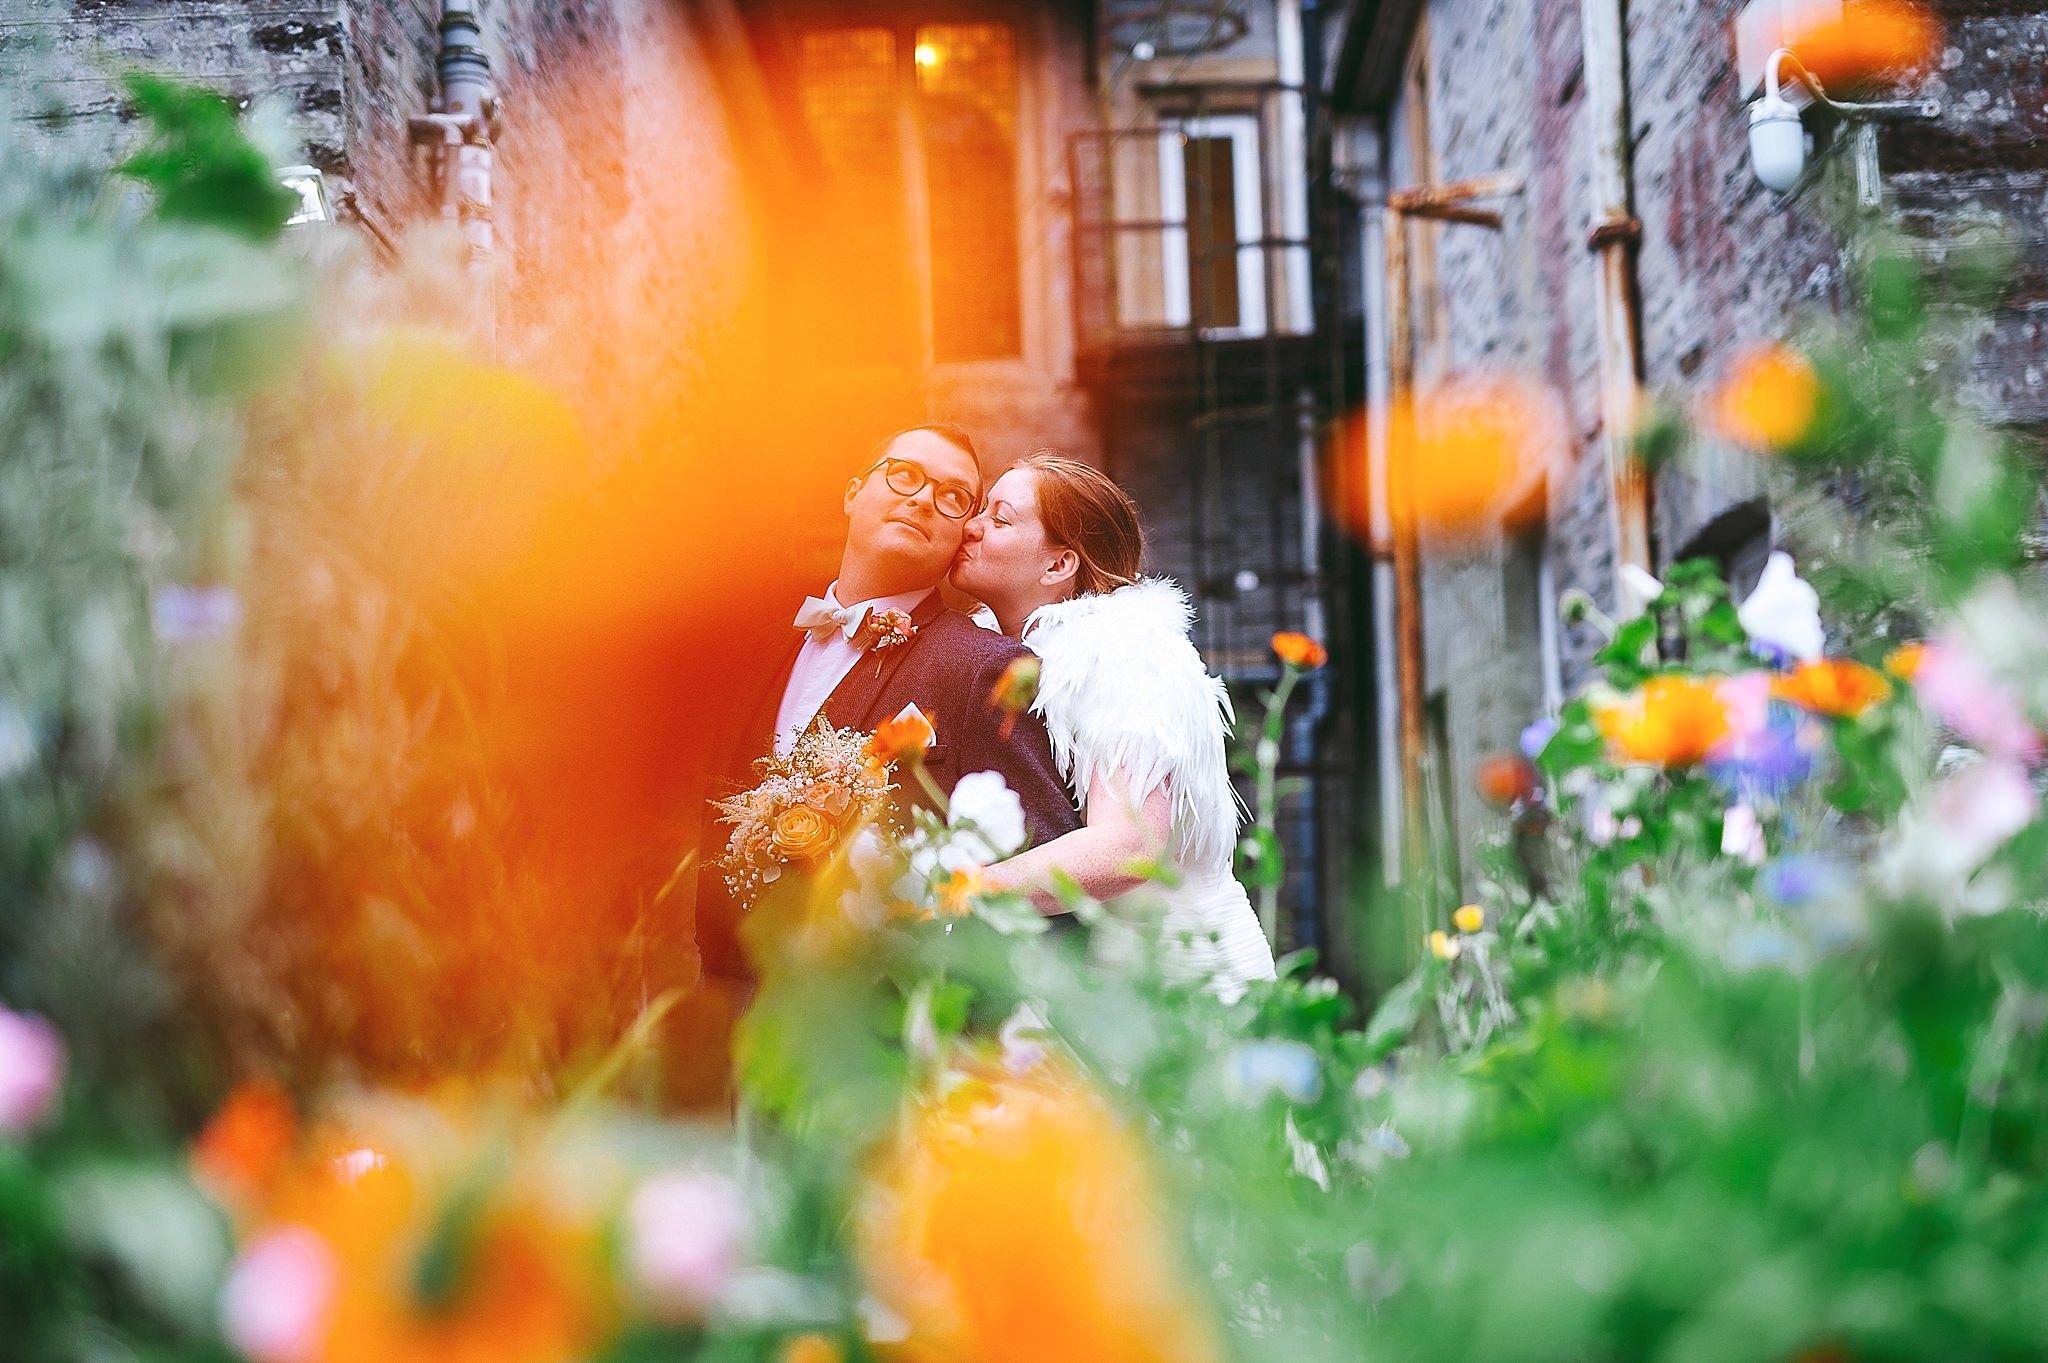 aga-tomaszek-wedding-photographer-cardiff-2016_1041